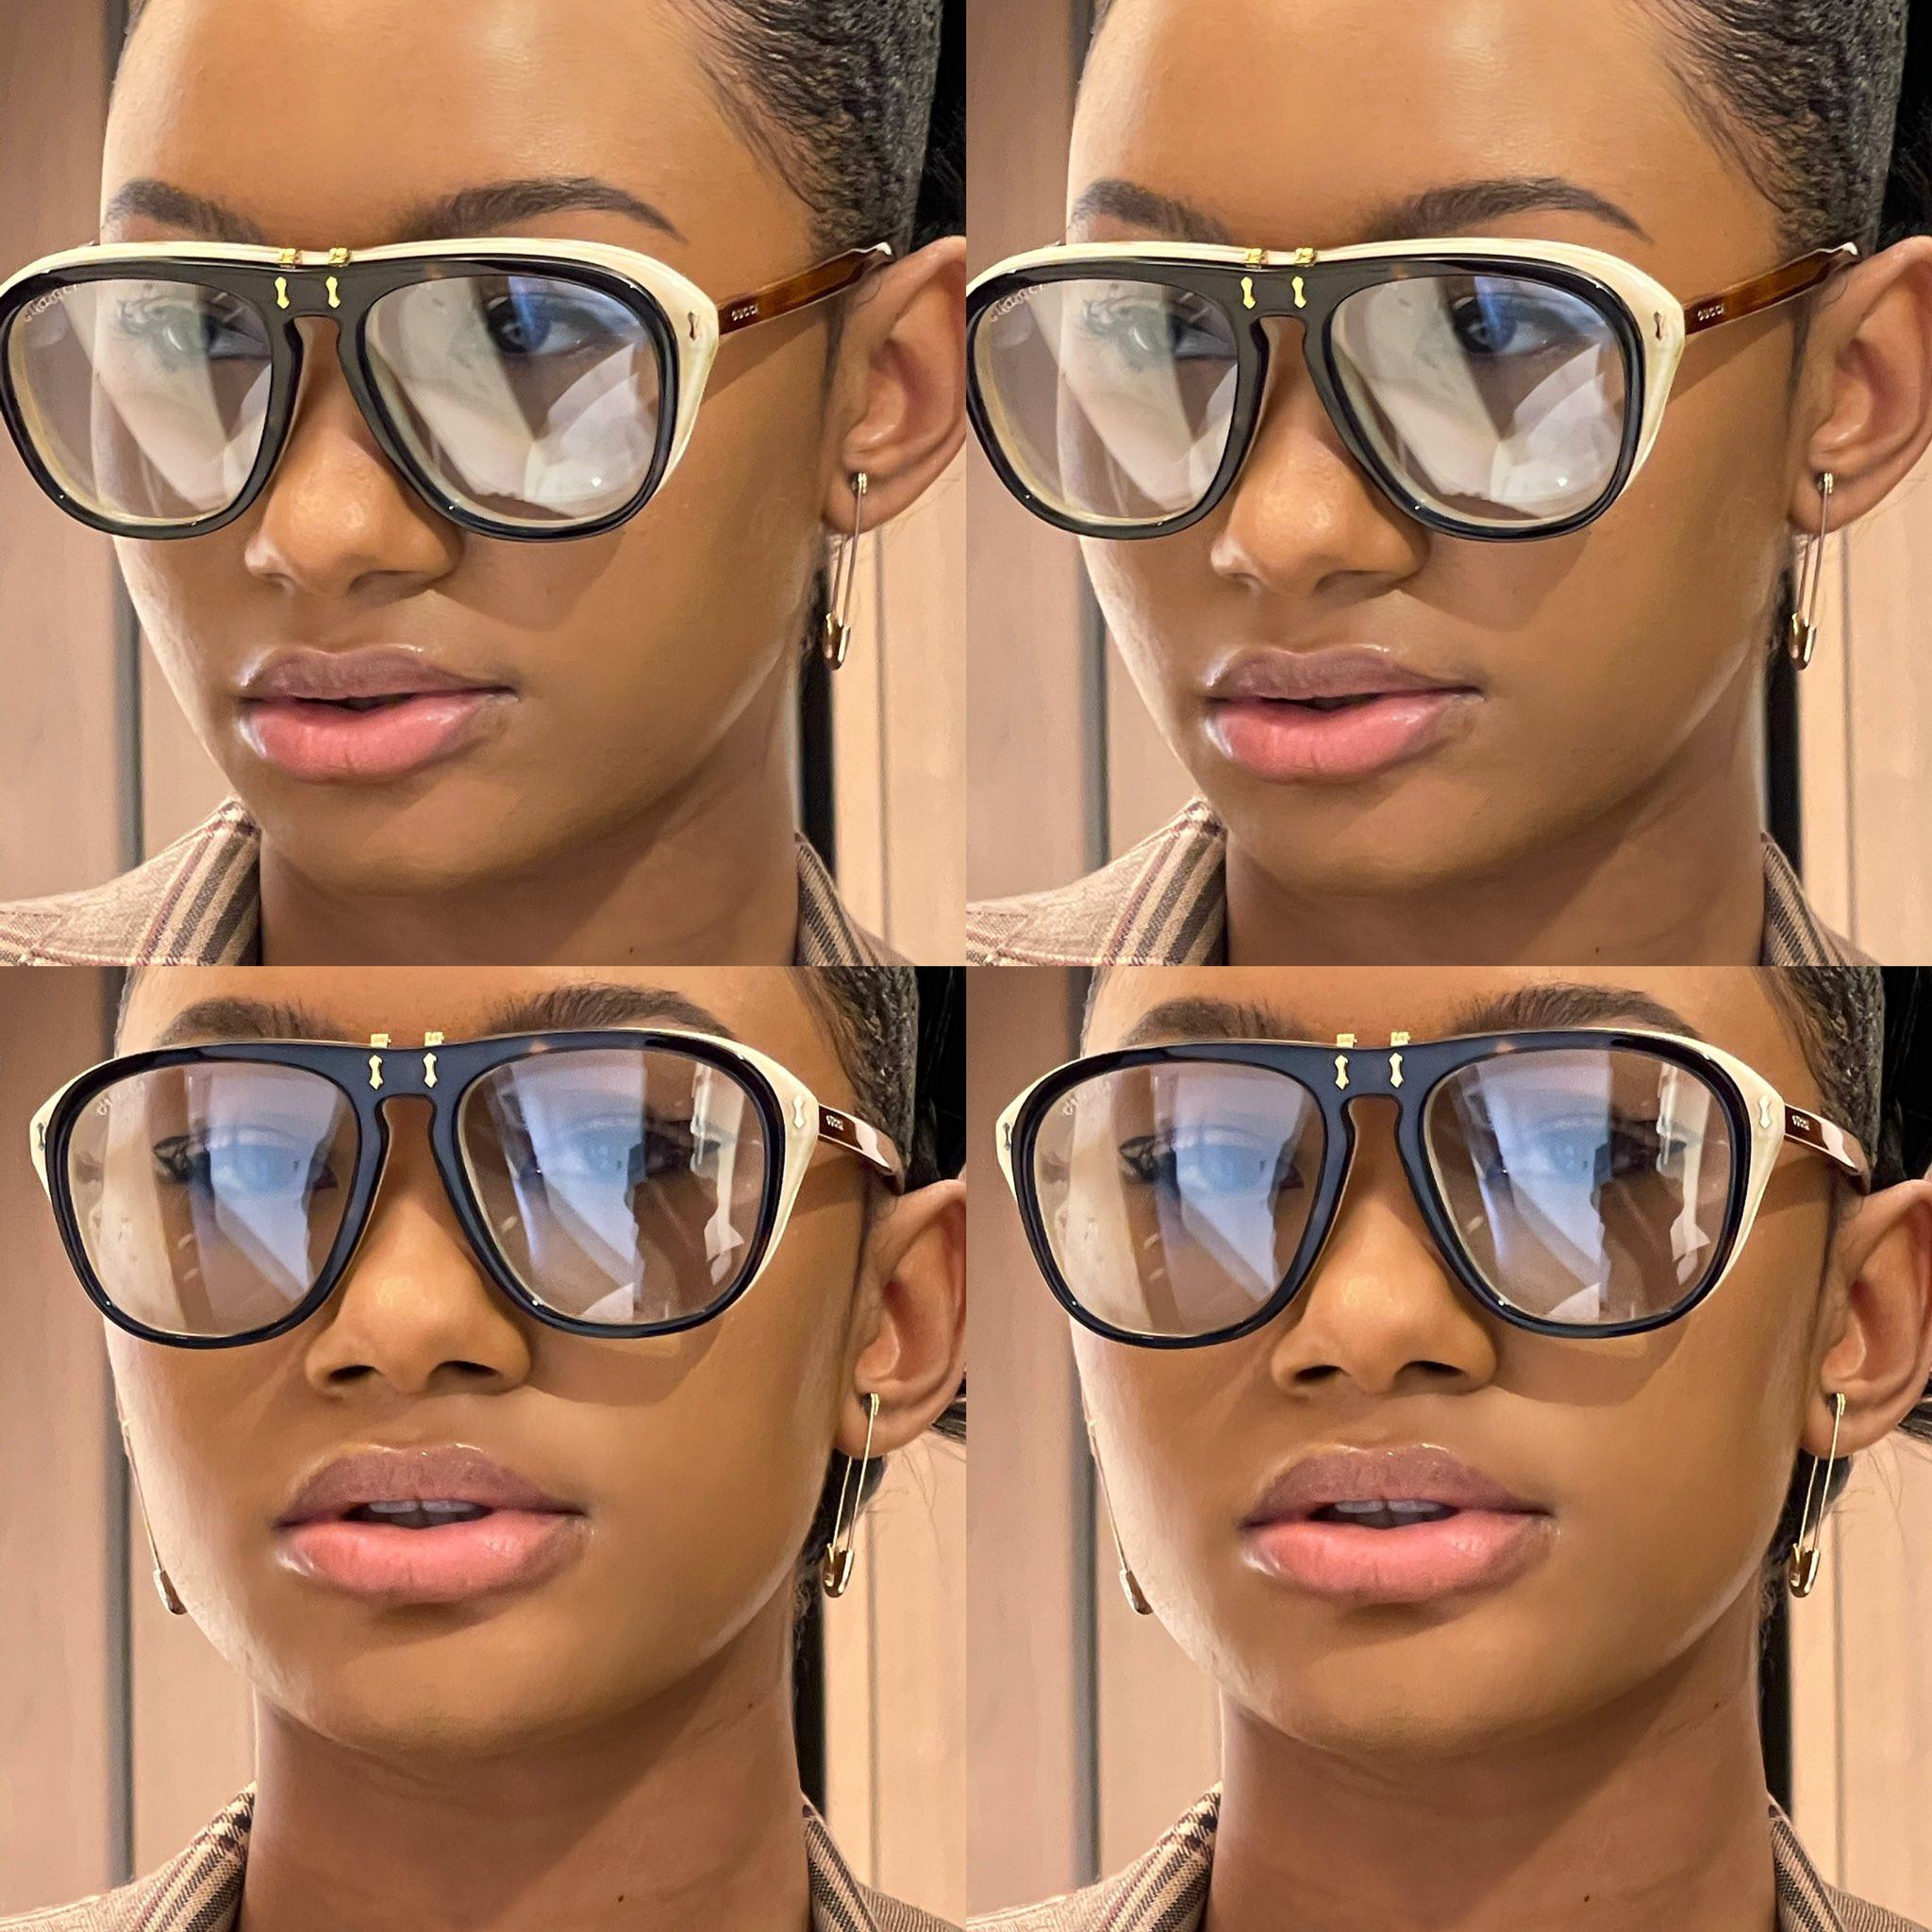 Temi Otedola rocks 14 Karat Gold Safety Pin earrings worth N114K in new photos lindaikejisblog